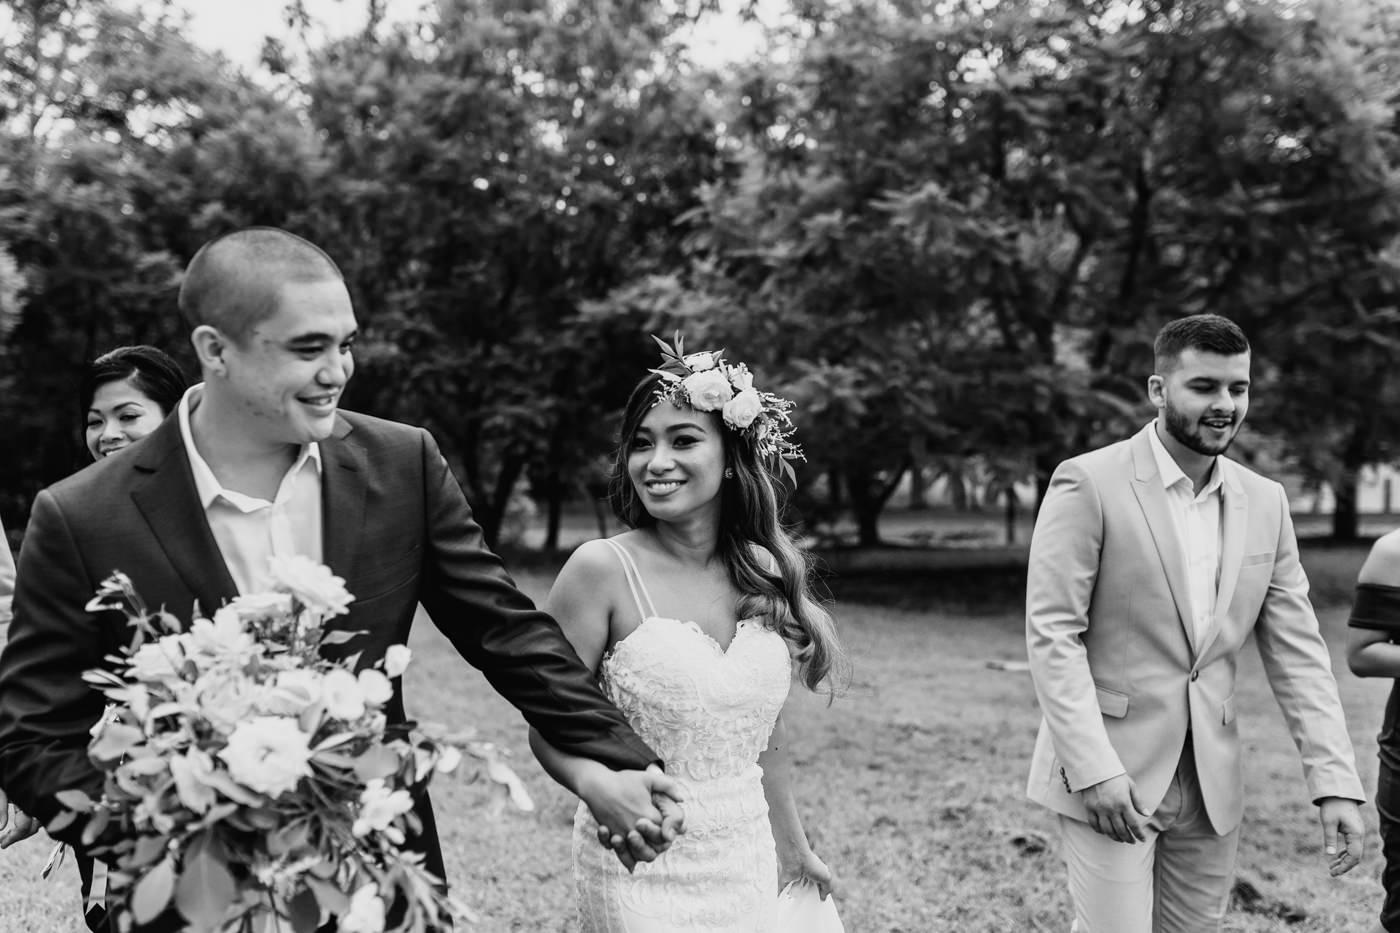 Nick & Vanezza - Fernbank Farm Wedding - Samantha Heather Photography-93.jpg